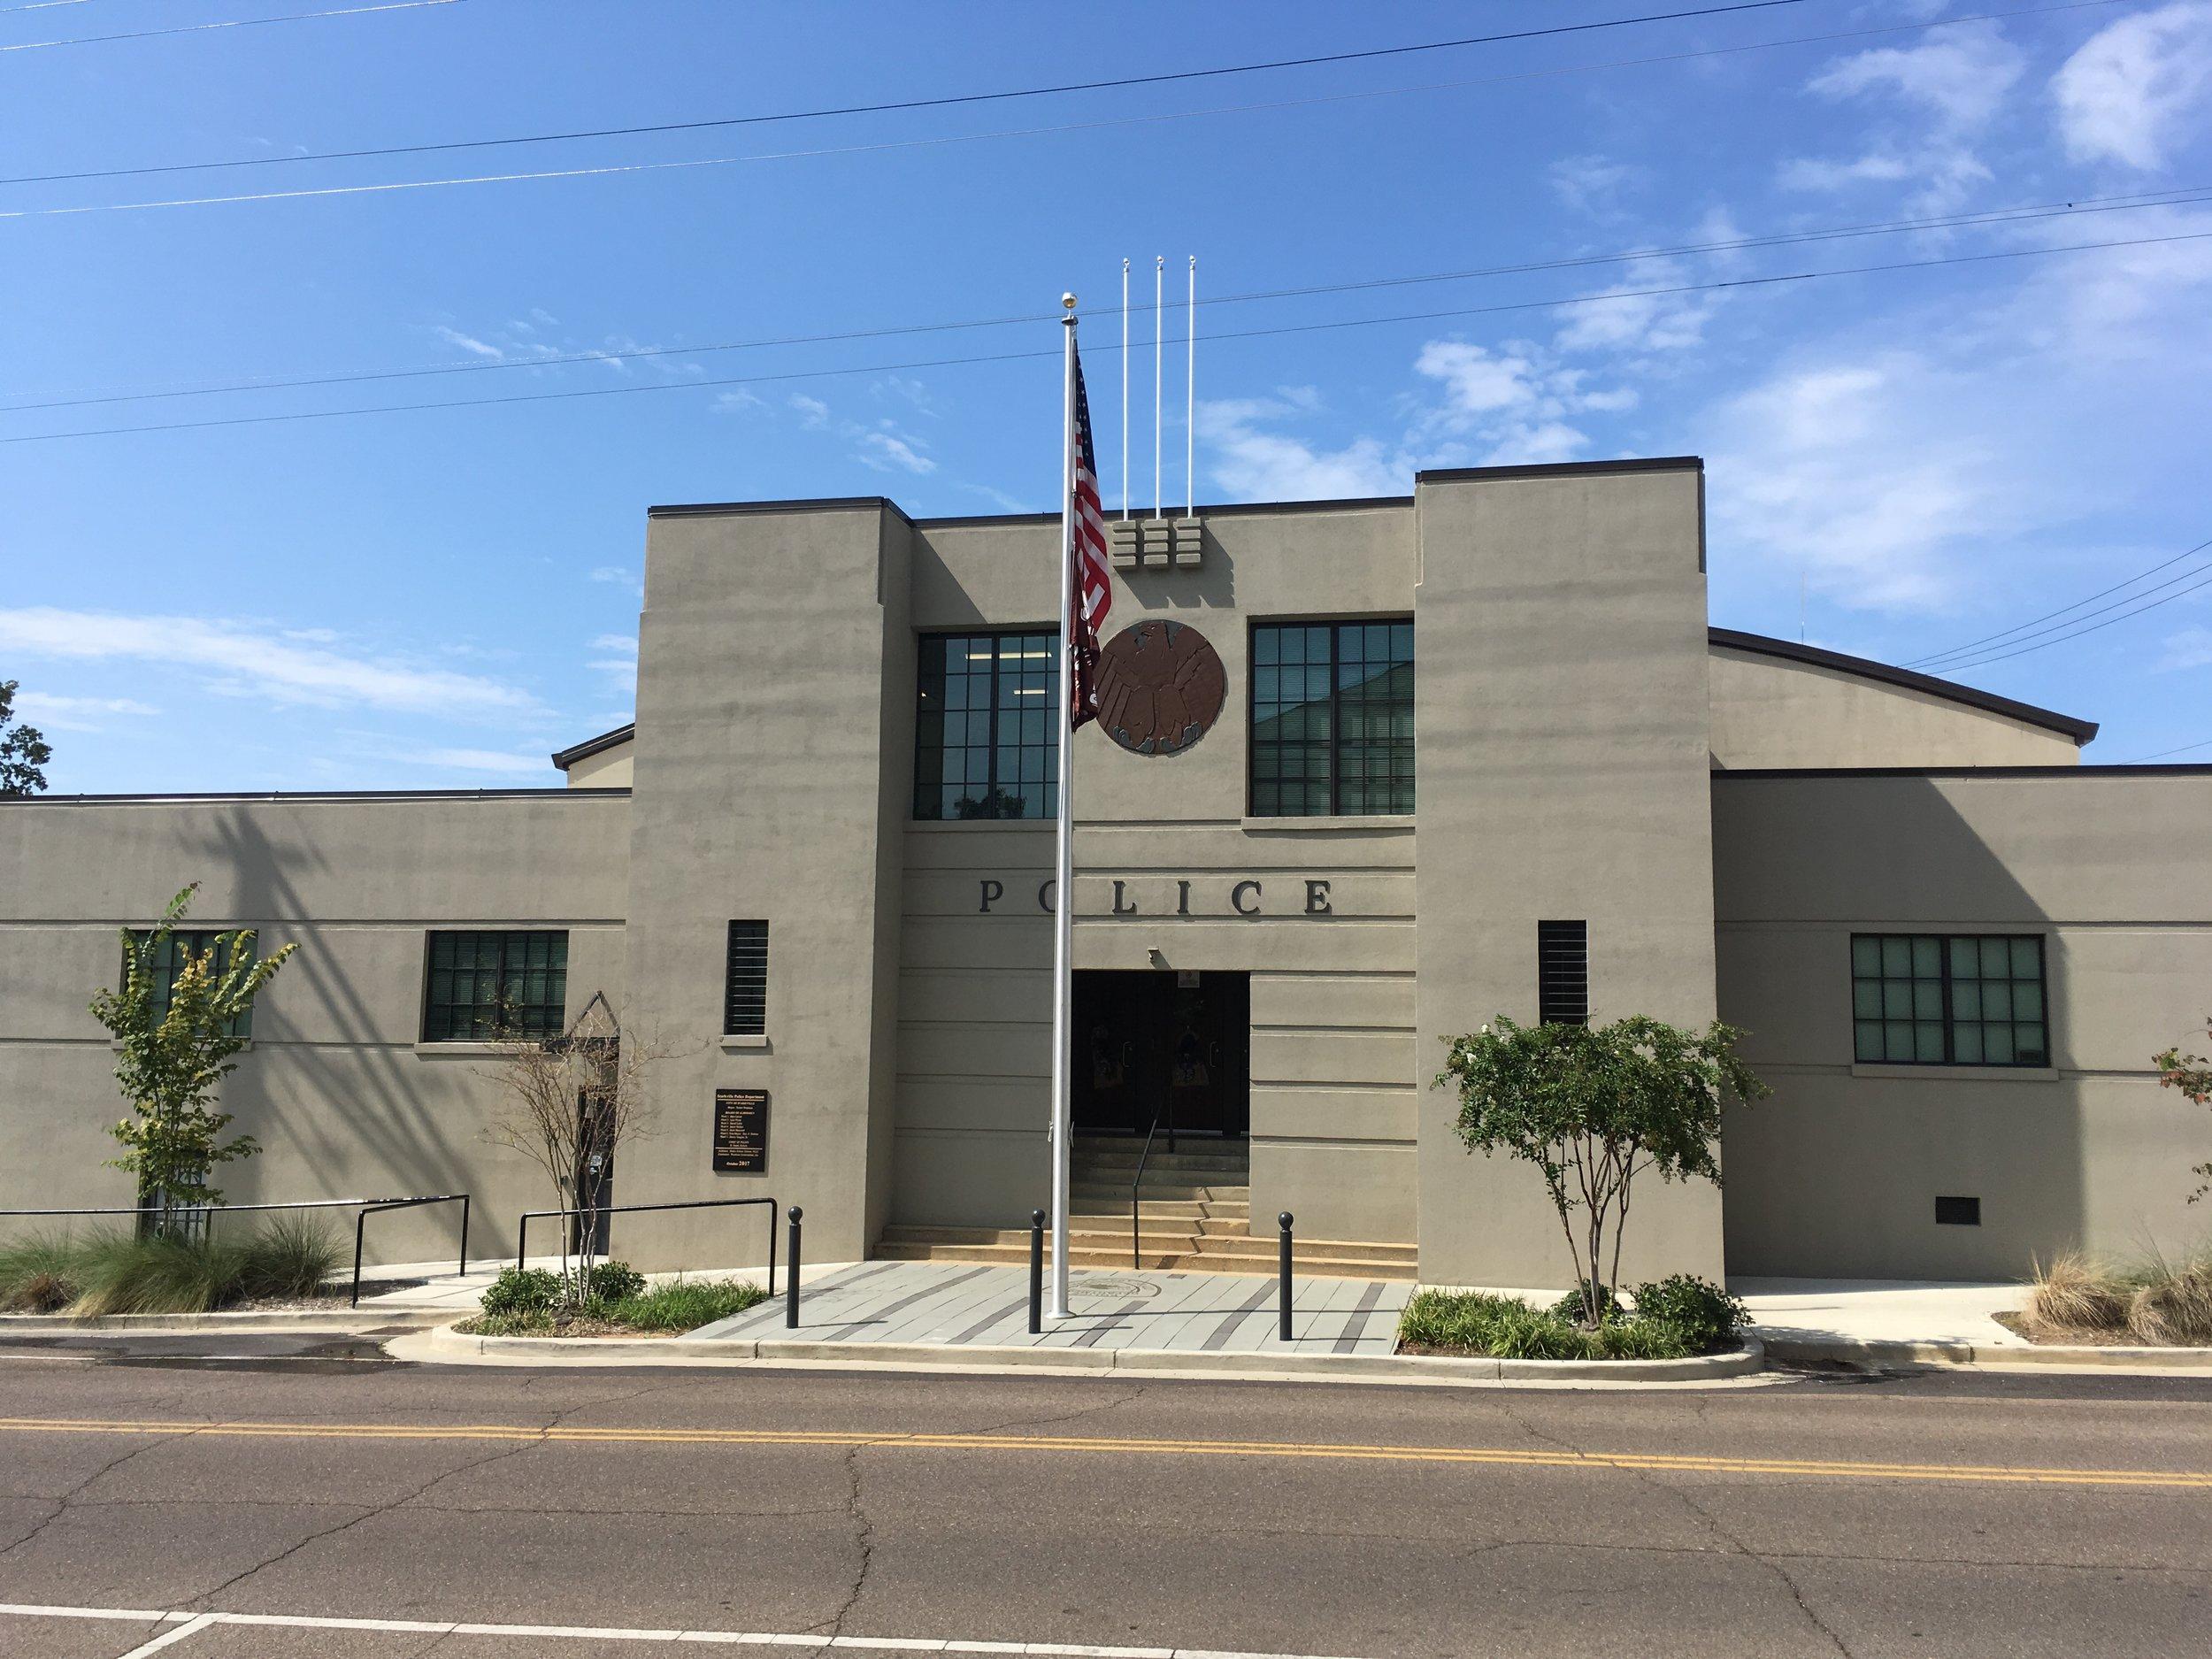 Starkville Police Station - Historical Renovation 2018